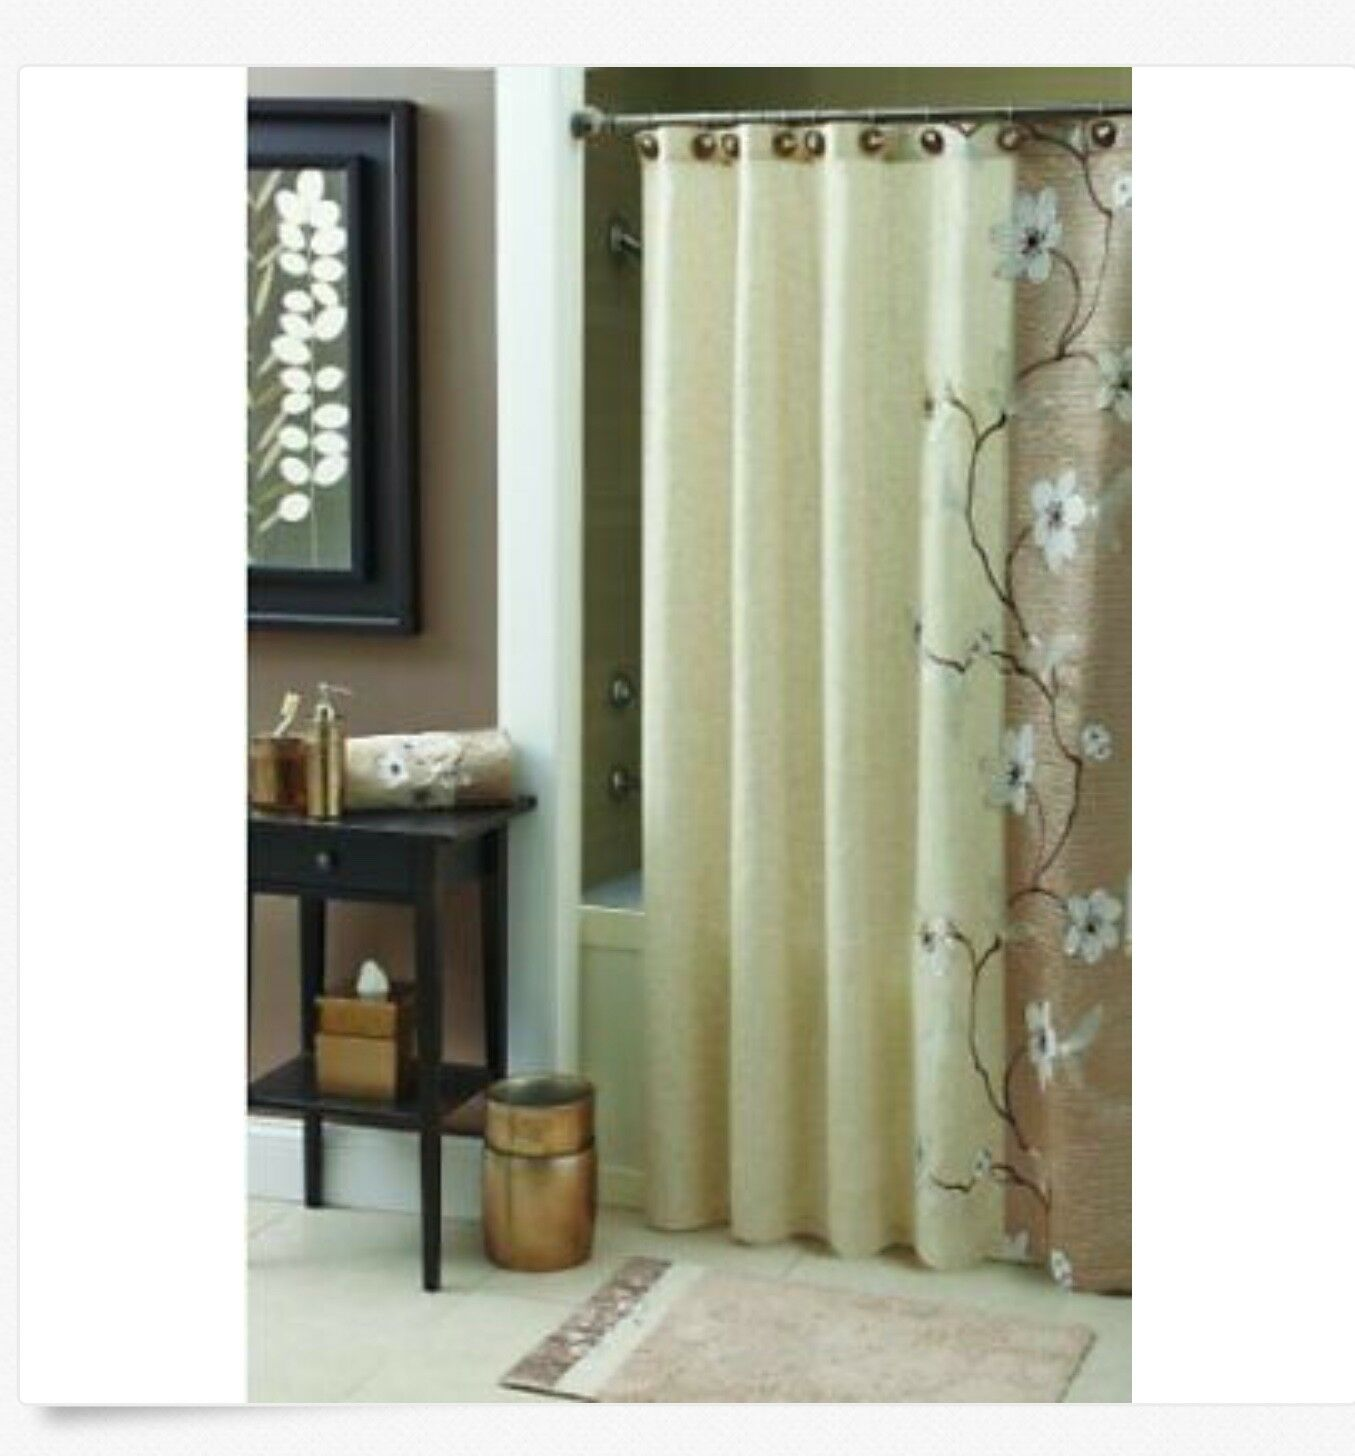 Croscill Magnolia 70 X 72 Stall Shower Curtain Gold Beige Blossoms Flowers F9ddd5